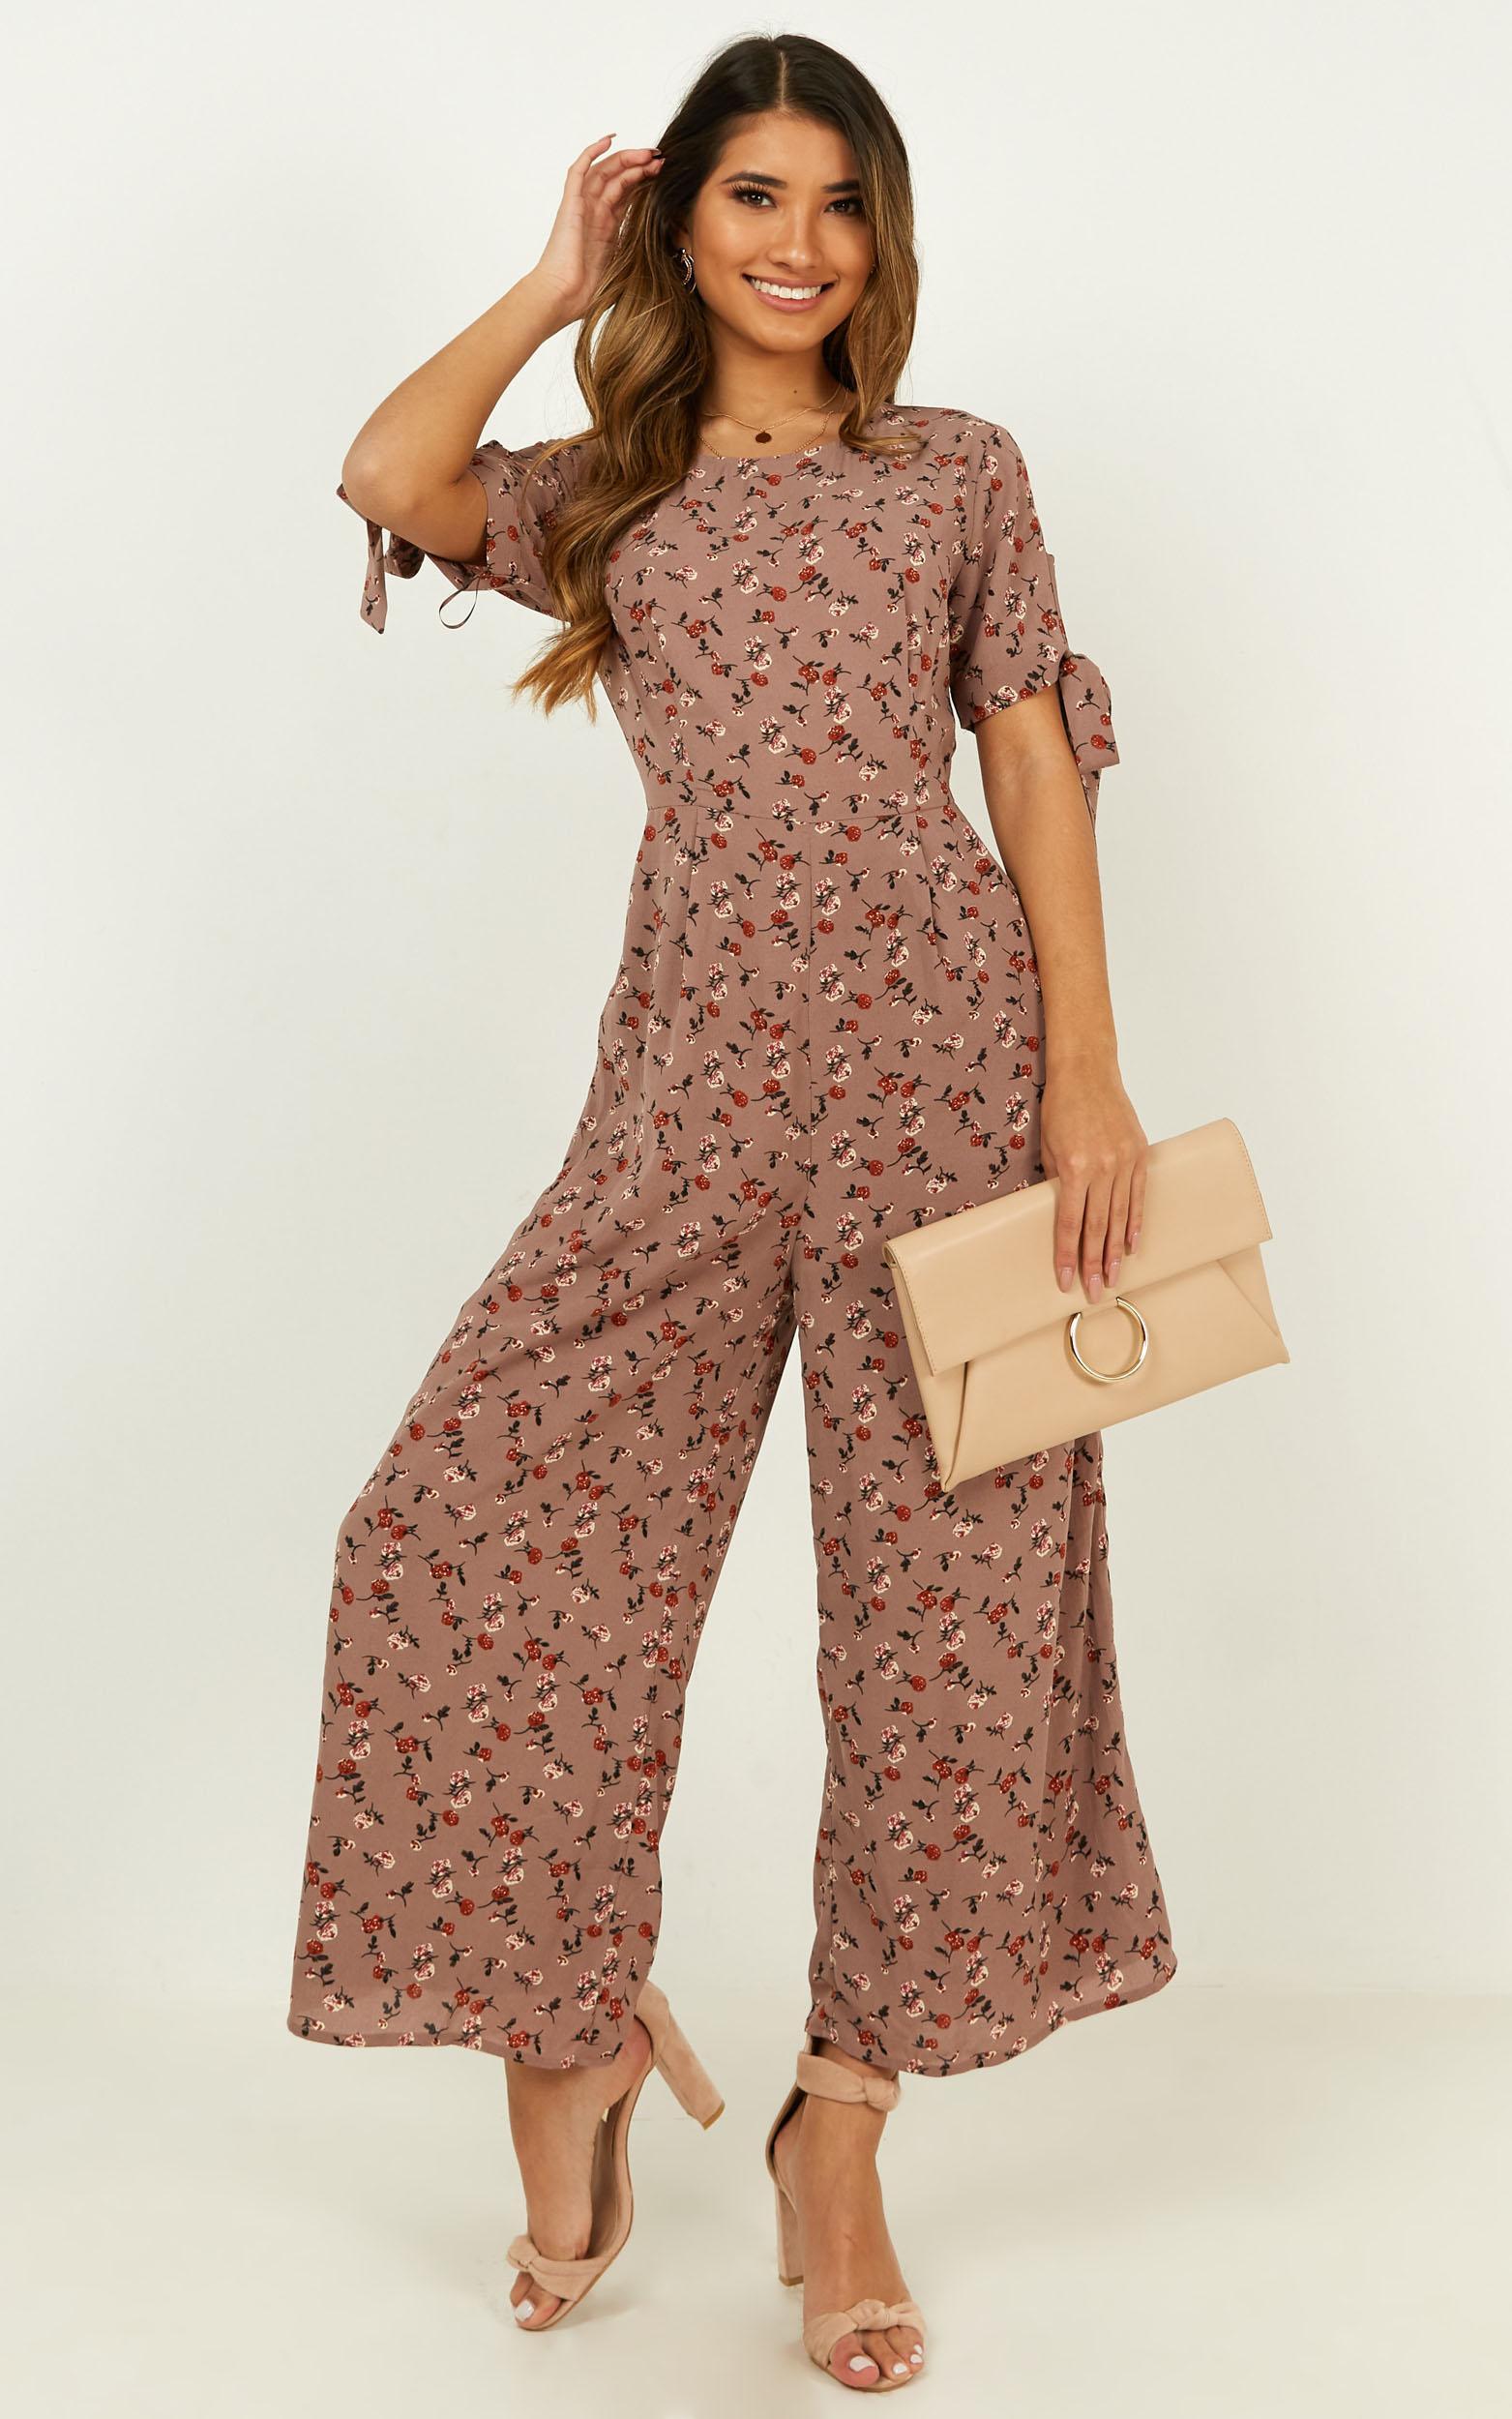 We Could Leave Jumpsuit in mocha floral - 20 (XXXXL), Mocha, hi-res image number null